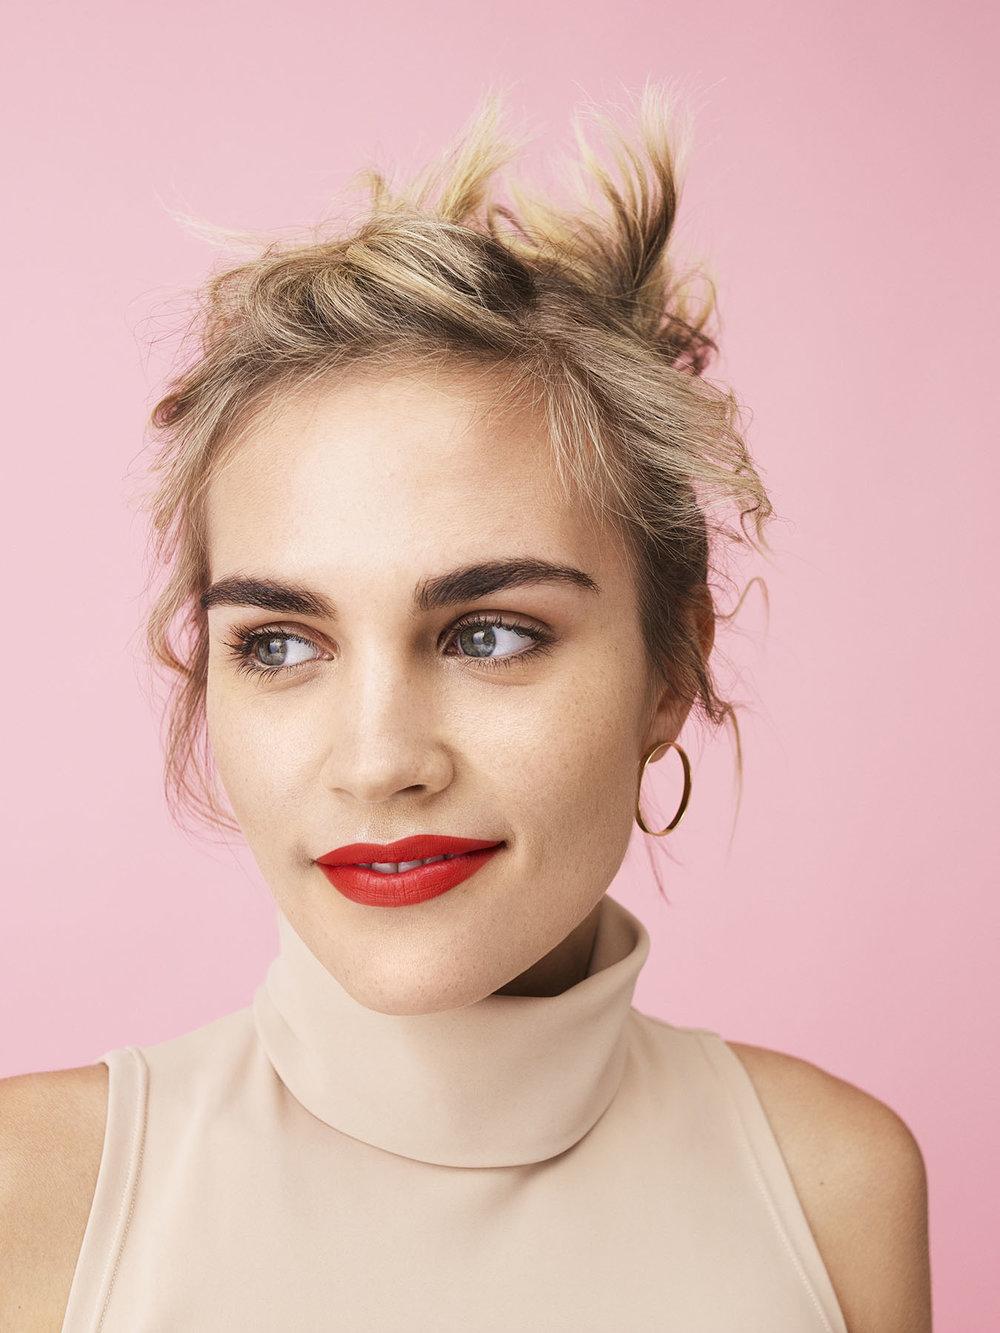 Photo: Nadya Wasylko  Hair: Jeanie Syfu  Makeup: Suzy Gernstein  Wardrobe: Morgan Gibbons  Manicure: Yukie Miyakawa  Model: Anastasia Eremenko